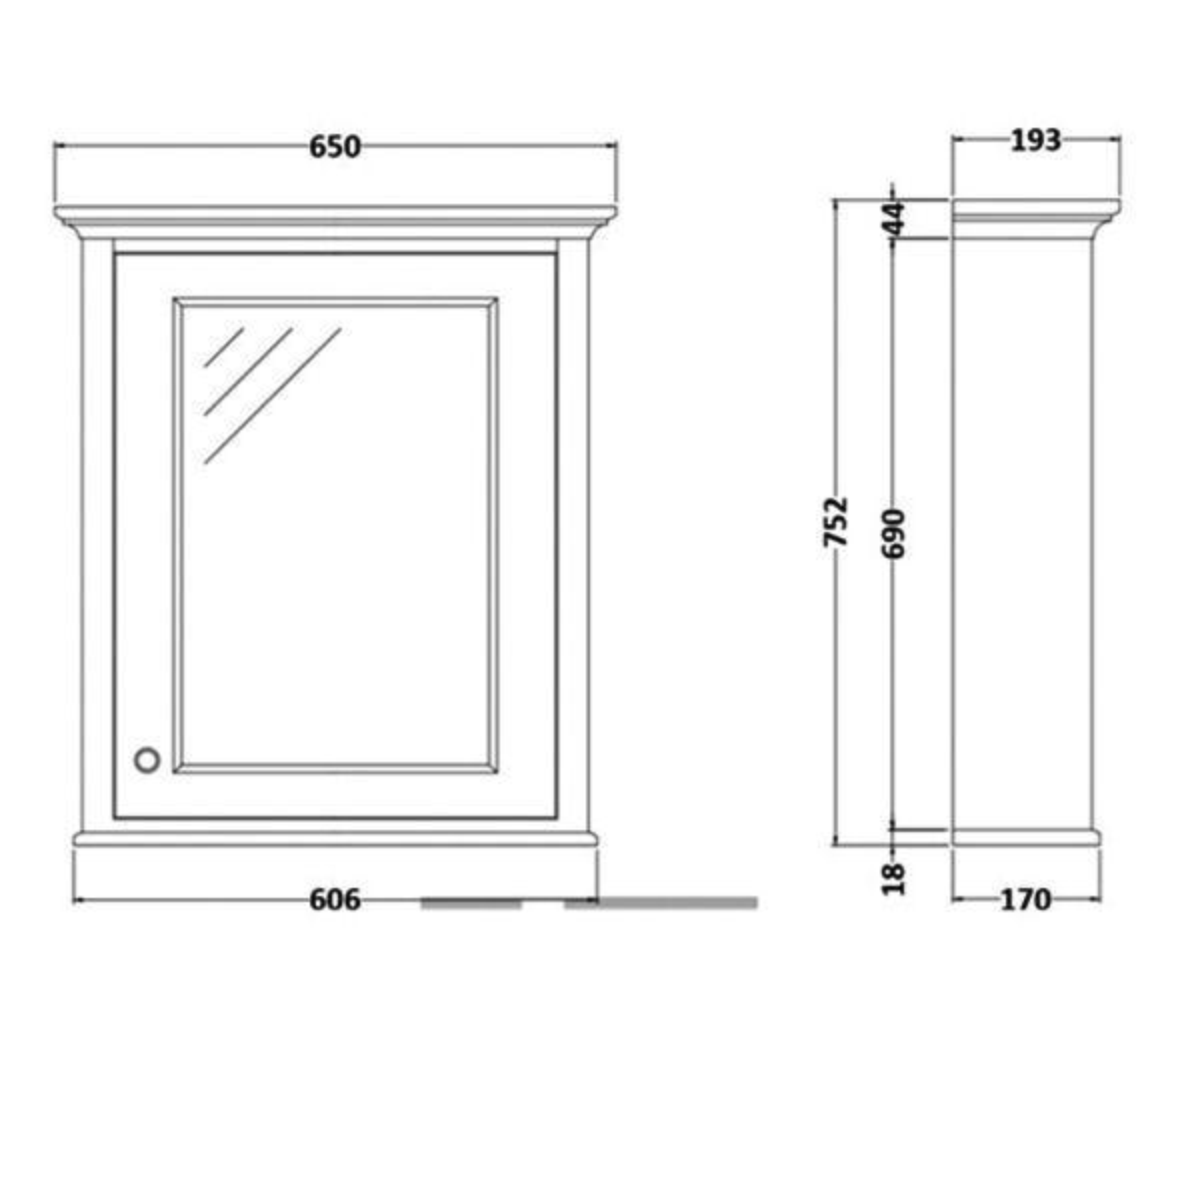 RAK Washington Grey Bathroom Mirror Cabinet 650mm Measurements